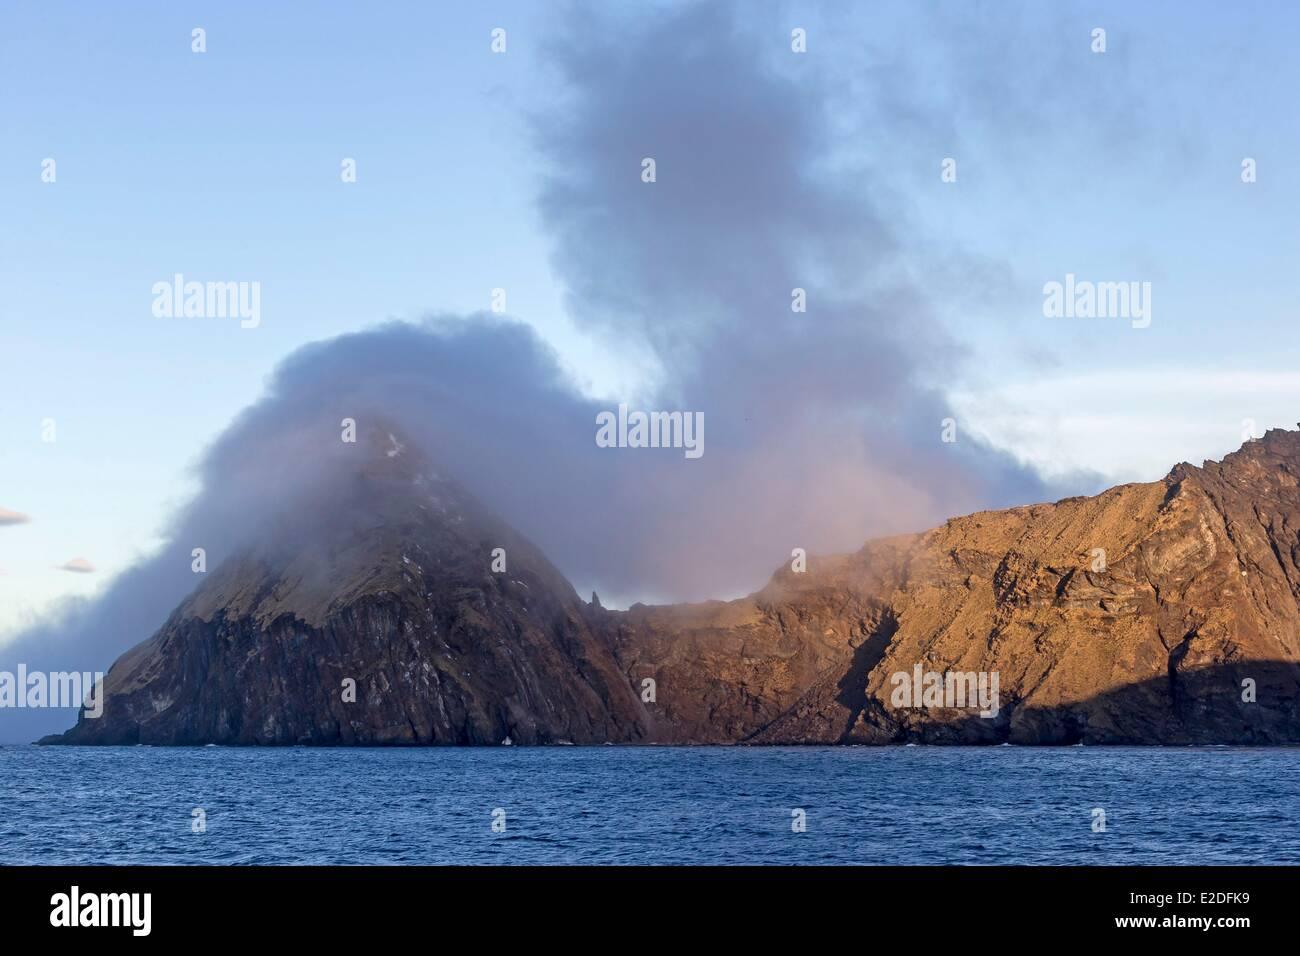 Antarctic, South Georgia Island, Baff Peninsula, Godthul - Stock Image